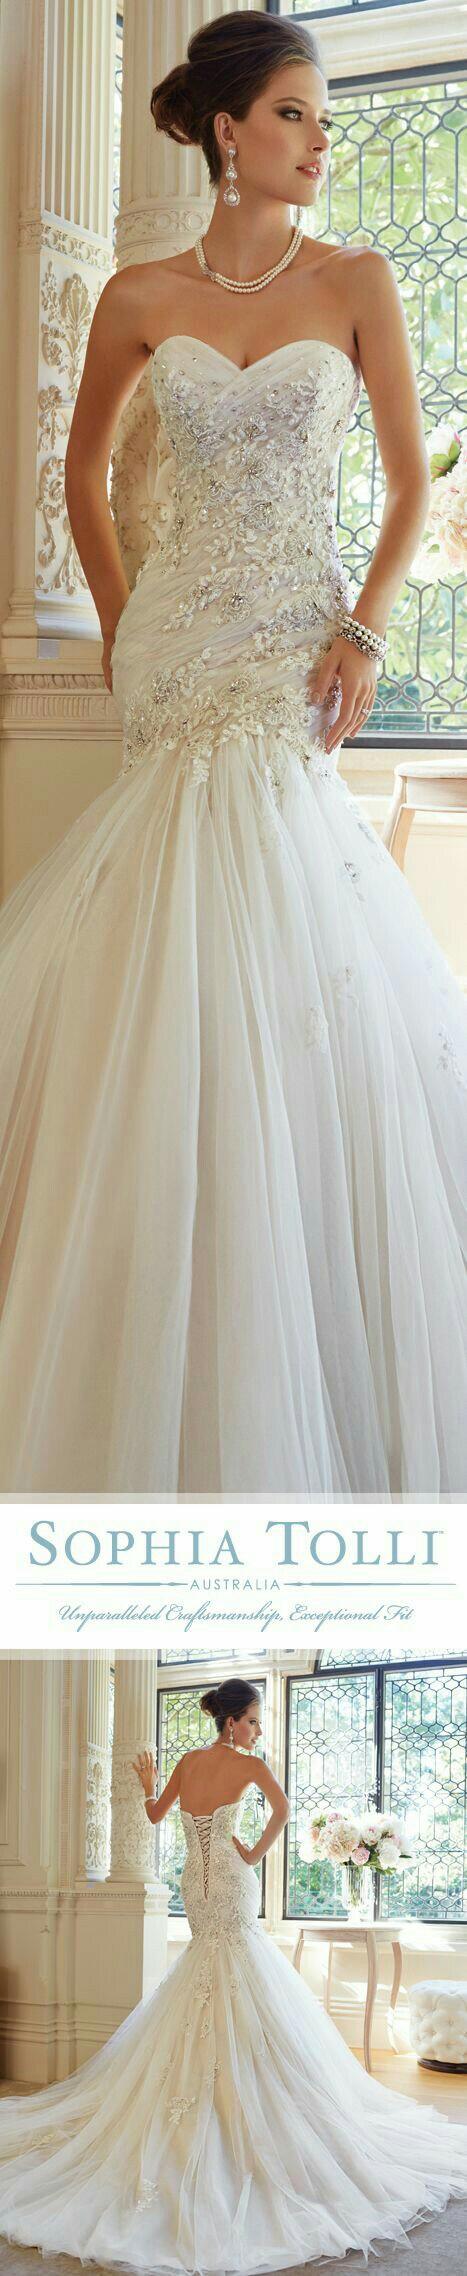 Pin von Danitza Galdámez auf Wedding Dresses | Pinterest